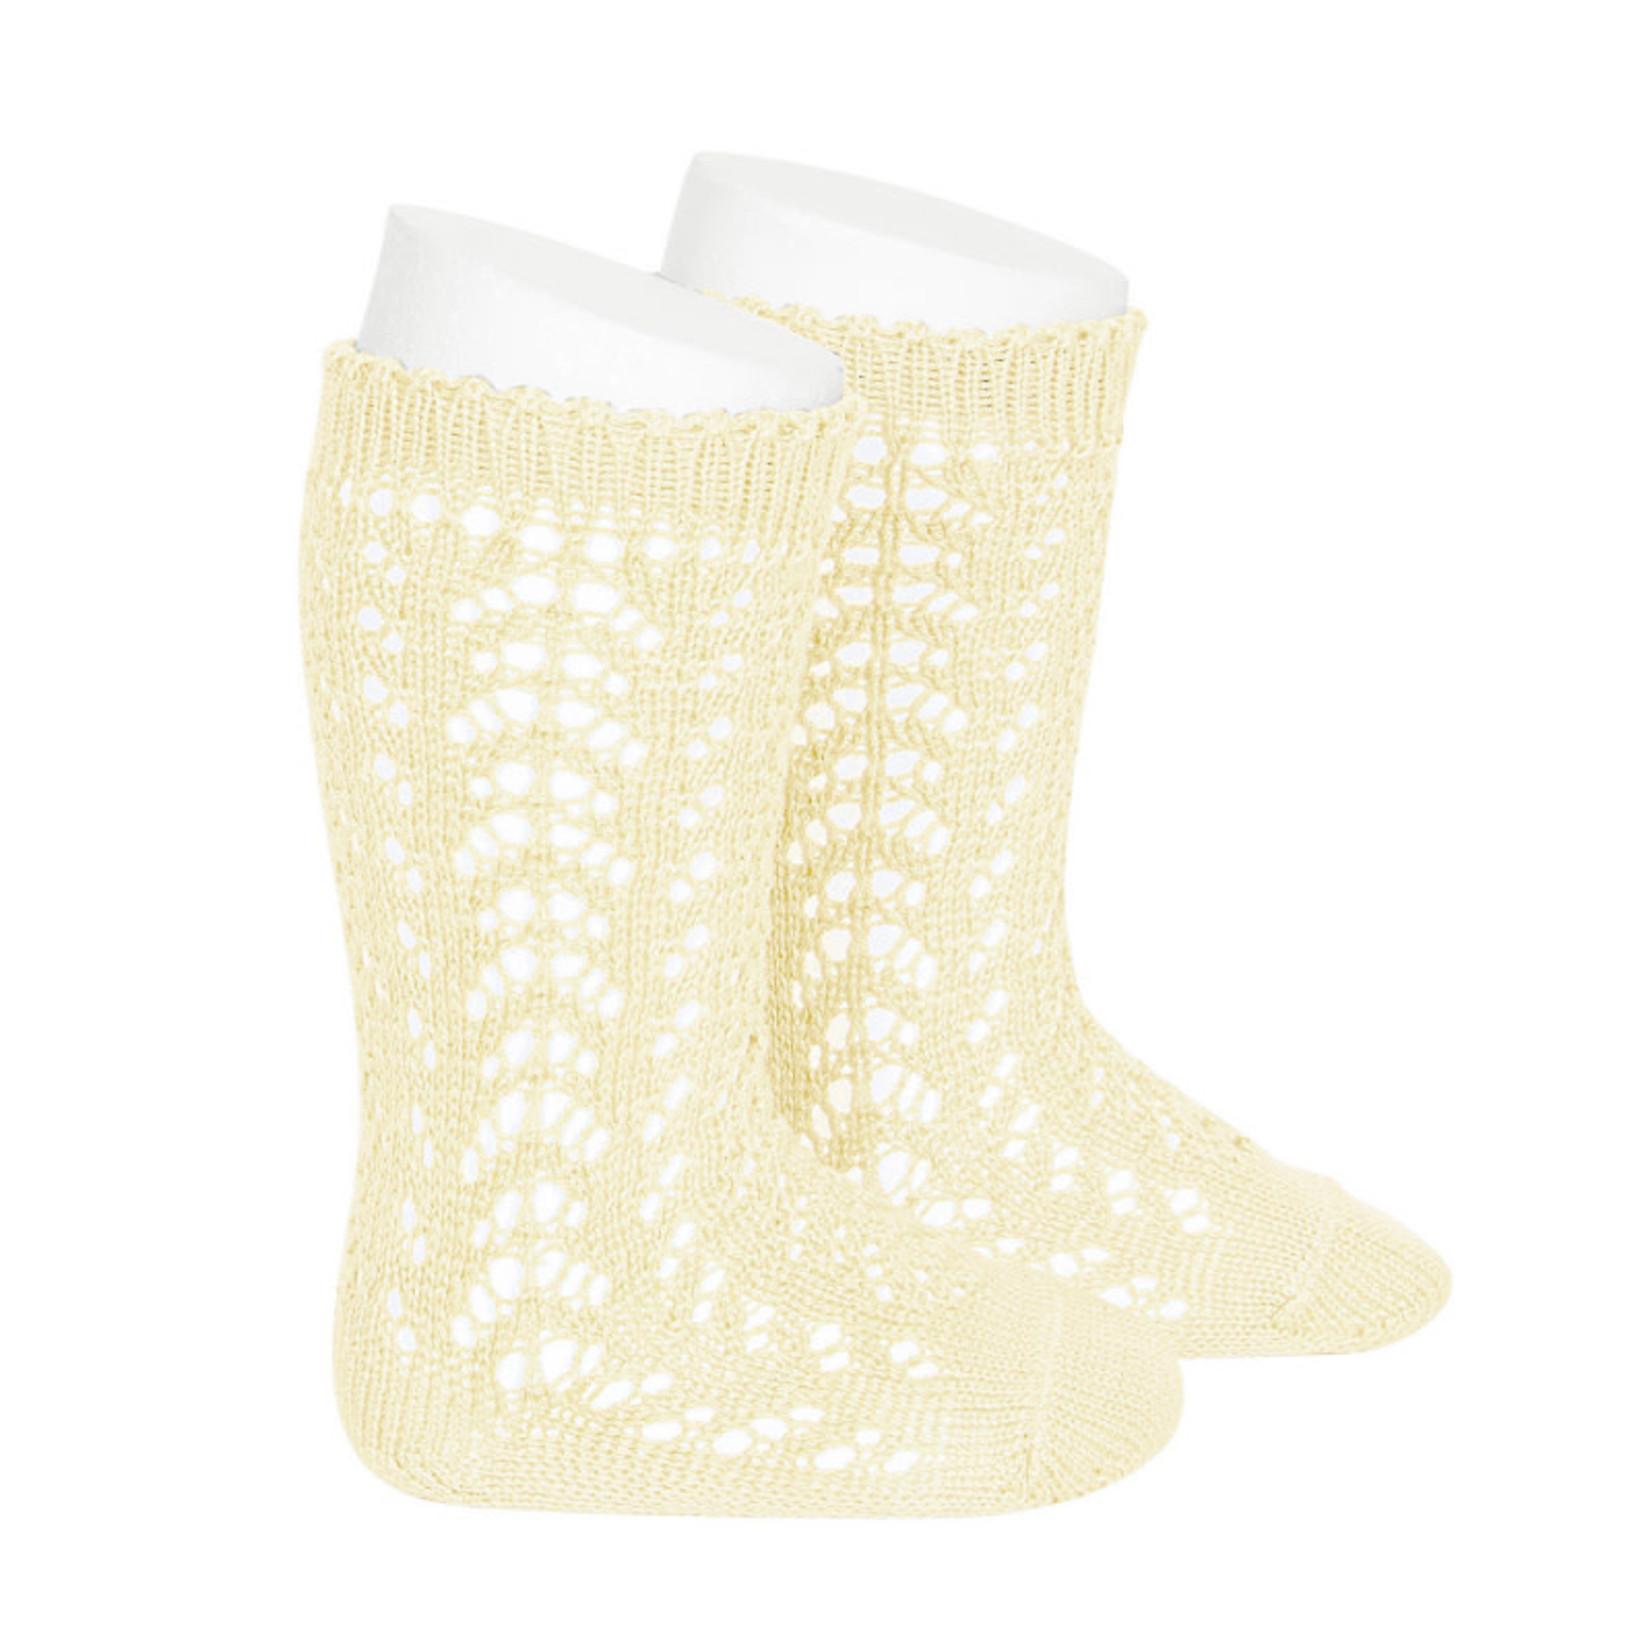 Condor Socks Open - Pale Yellow